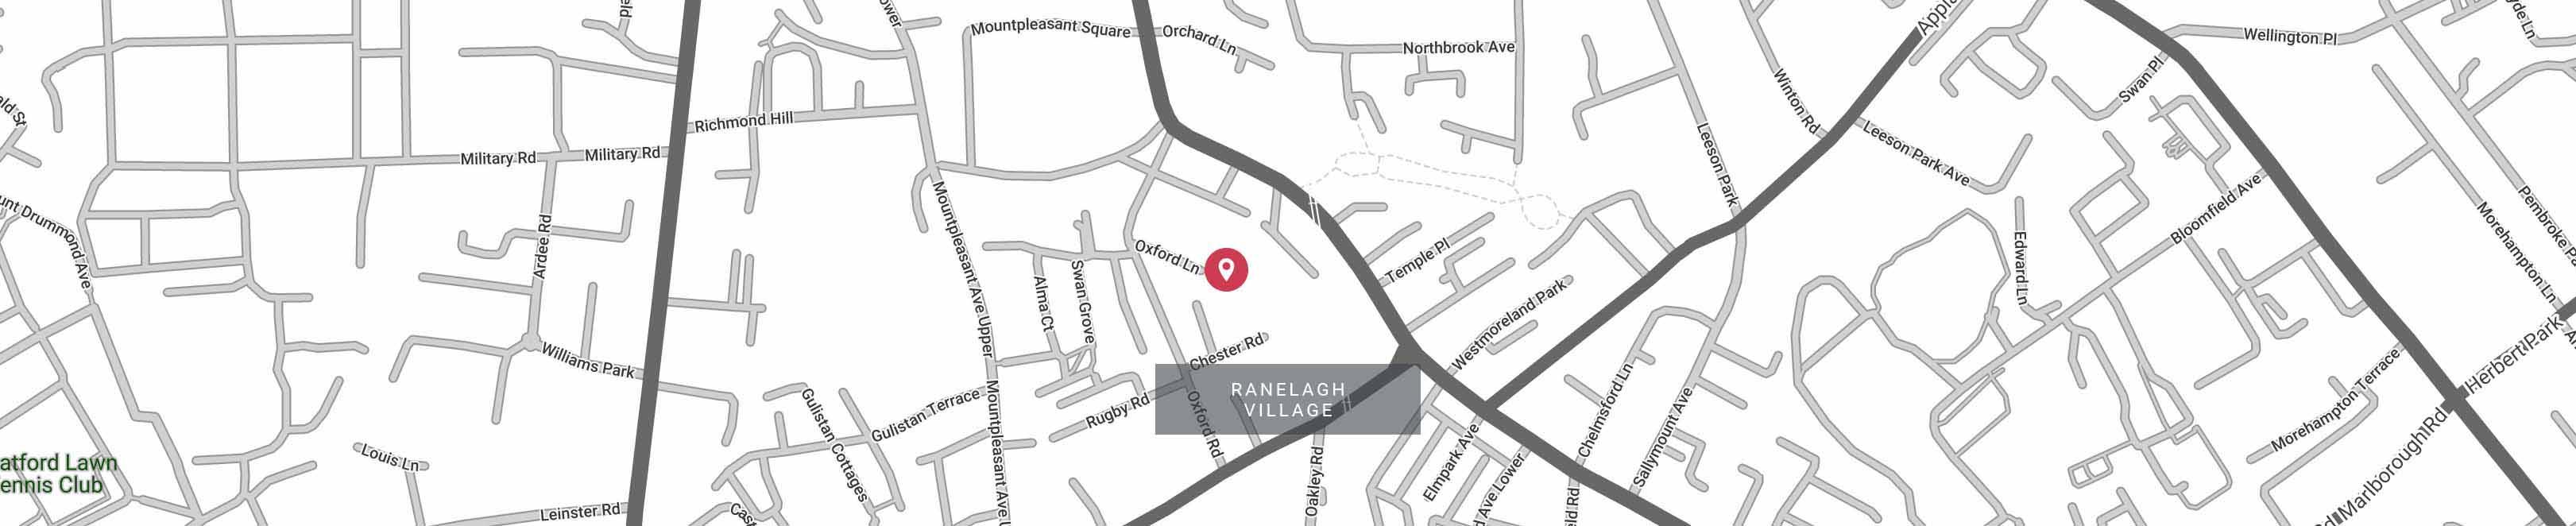 Ranelagh Envisagym Map Dublin Personal Training